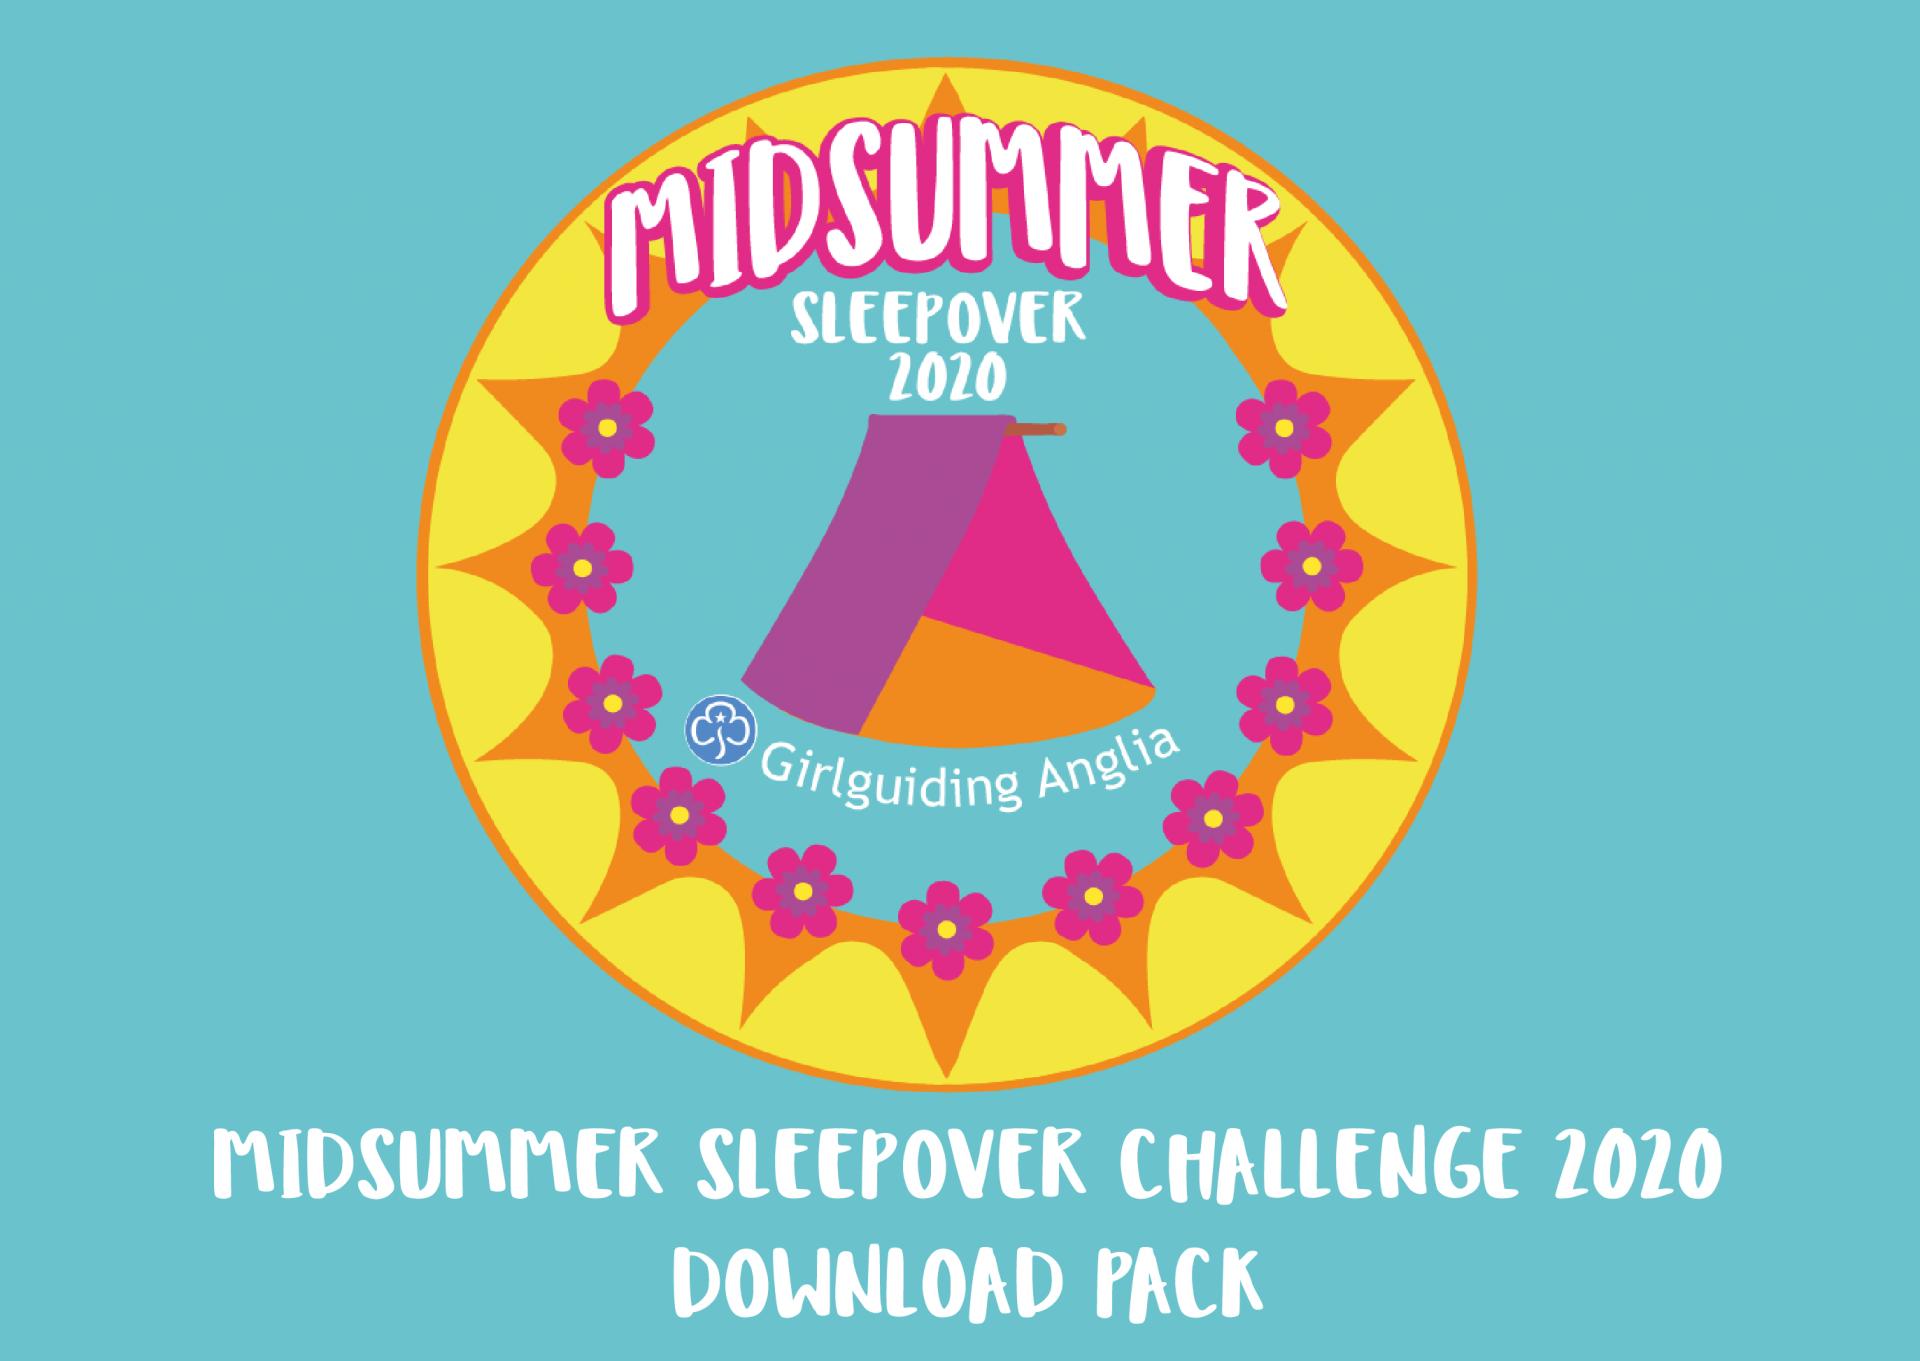 image relating to Midsummer Sleepover Challenge 2020 Download